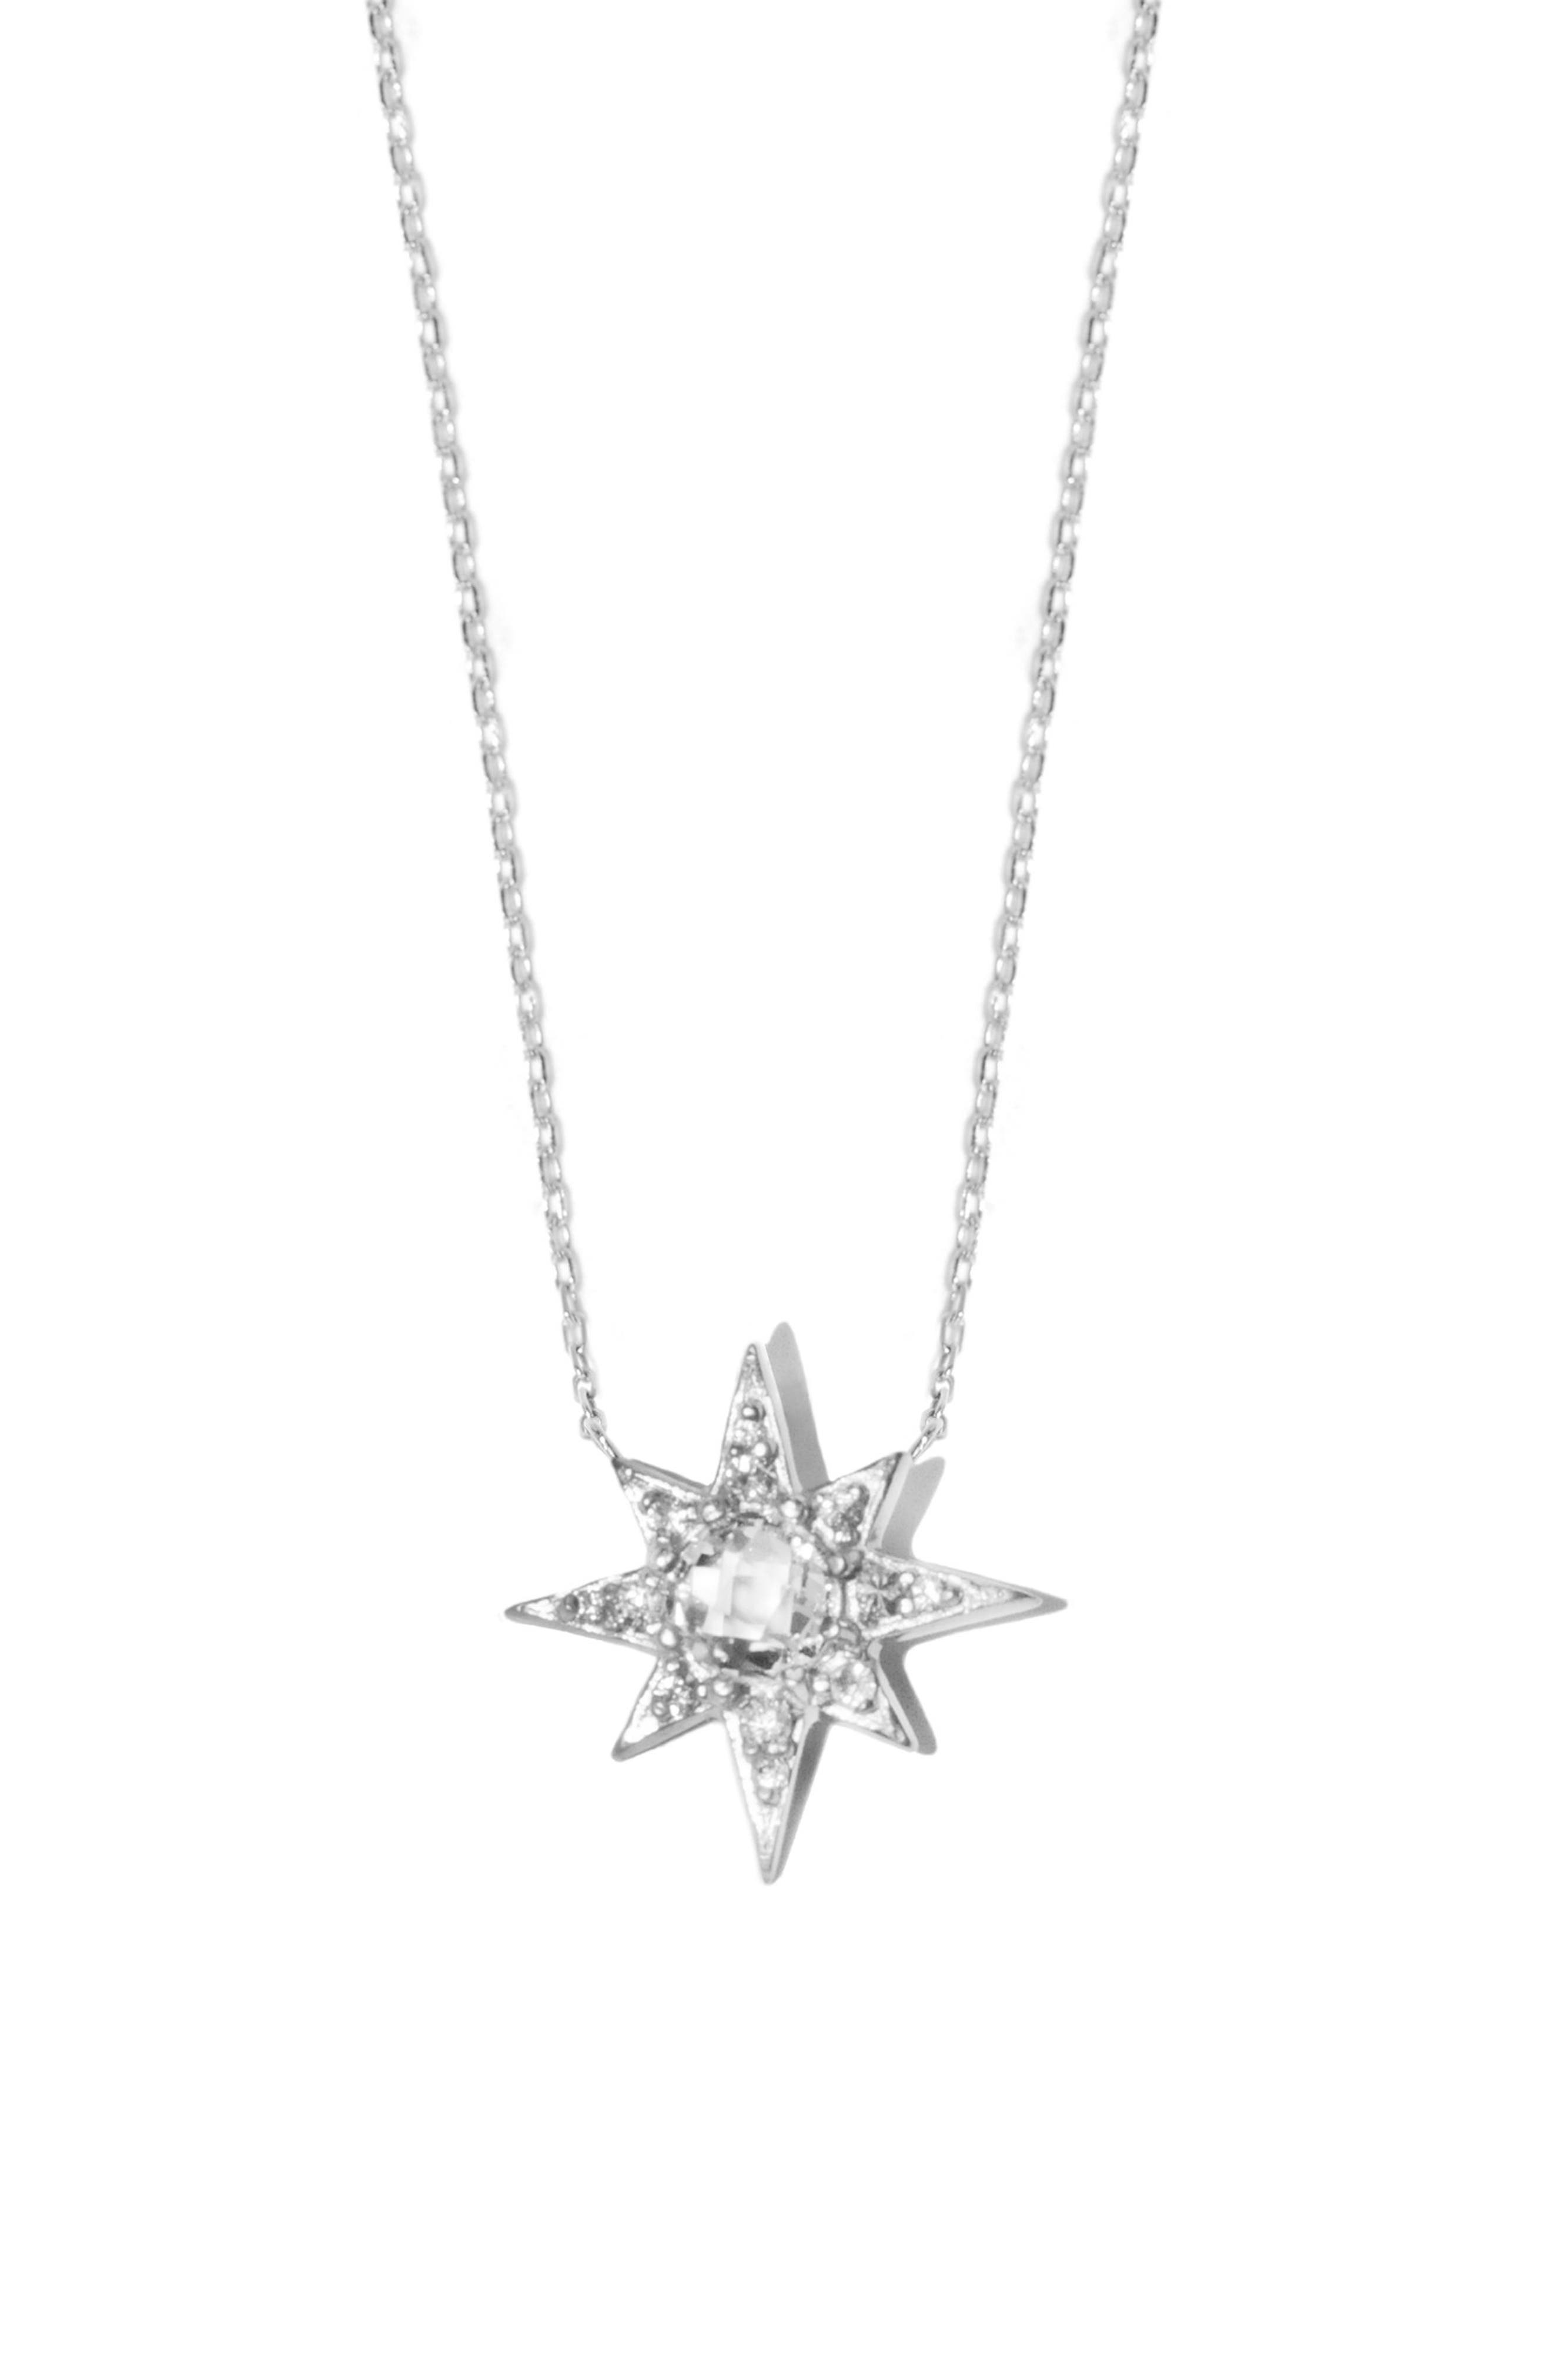 Starburst White Topaz Pendant Necklace